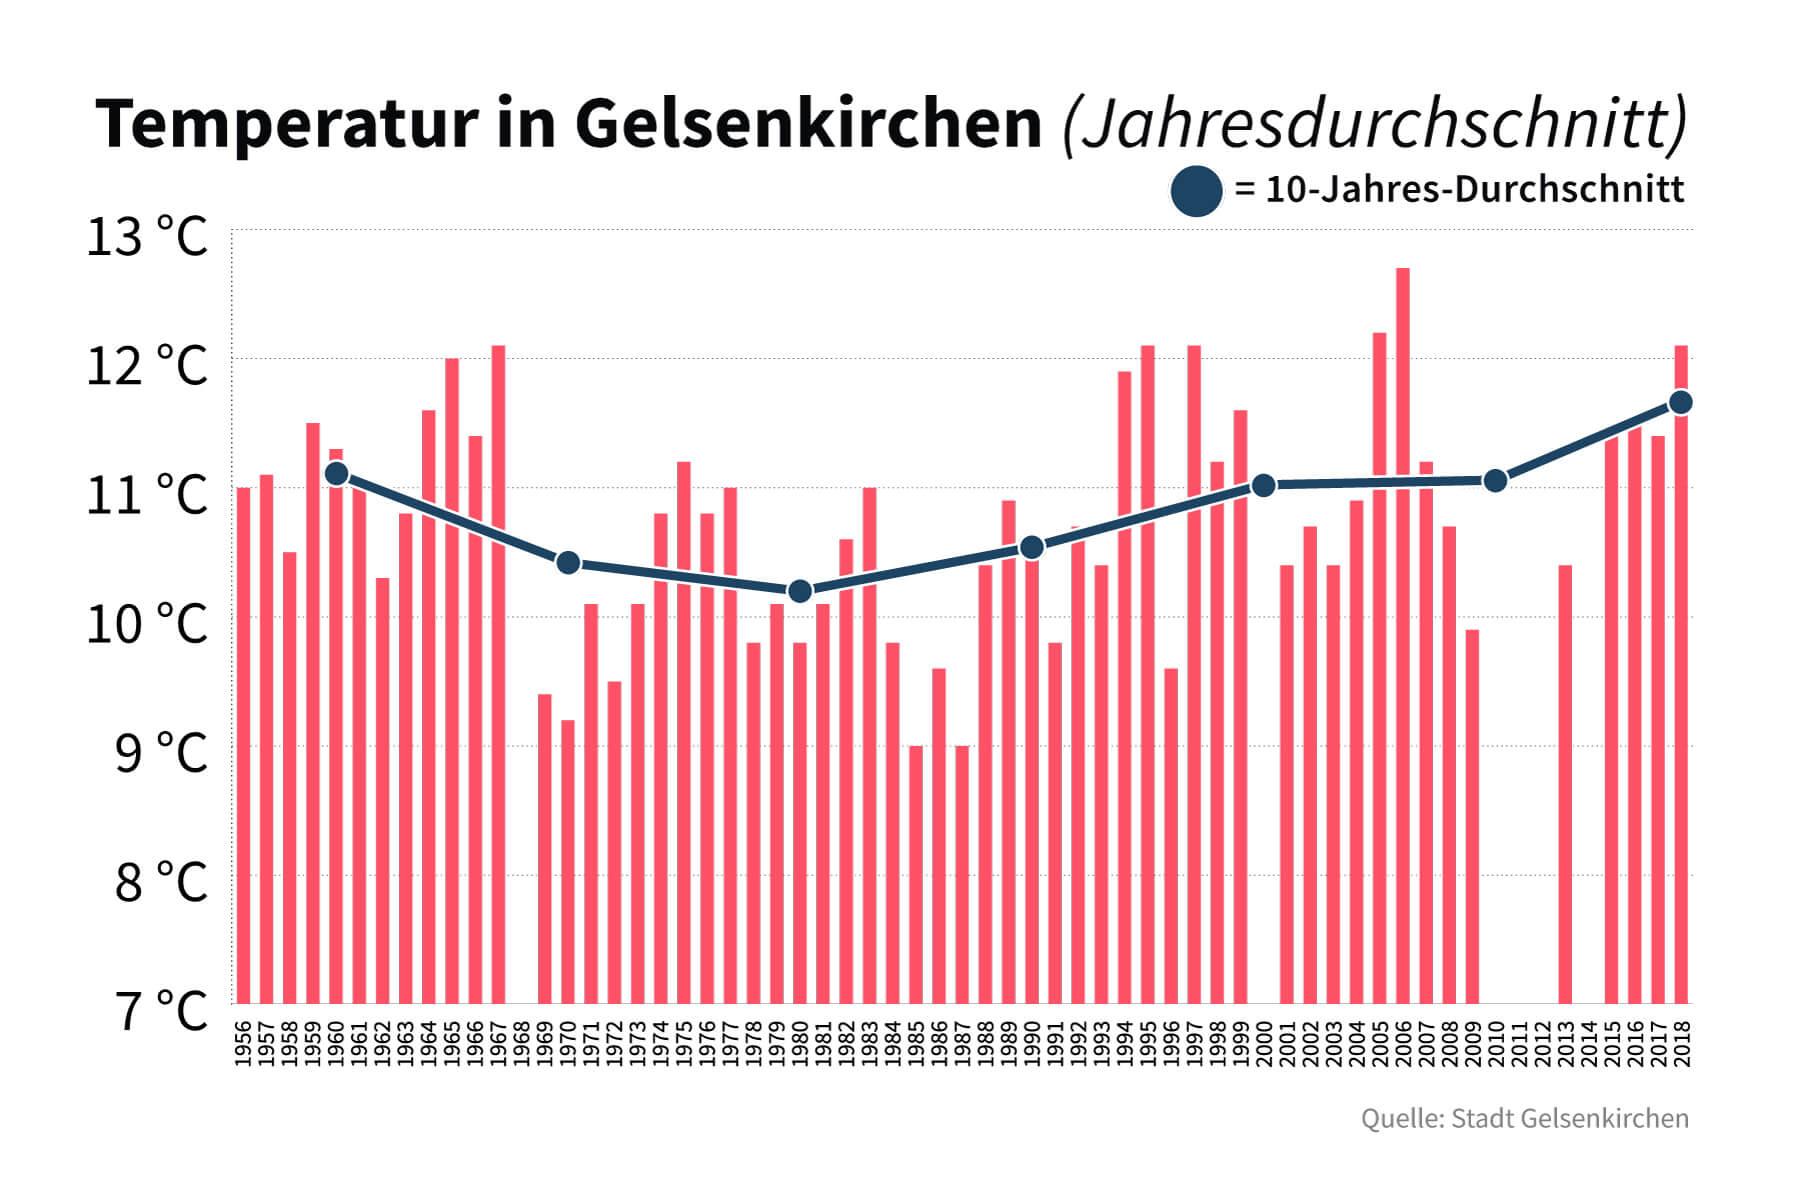 Klimakrise lokal: Mailand oder Gelsenkirchen? Hauptsache Italien!